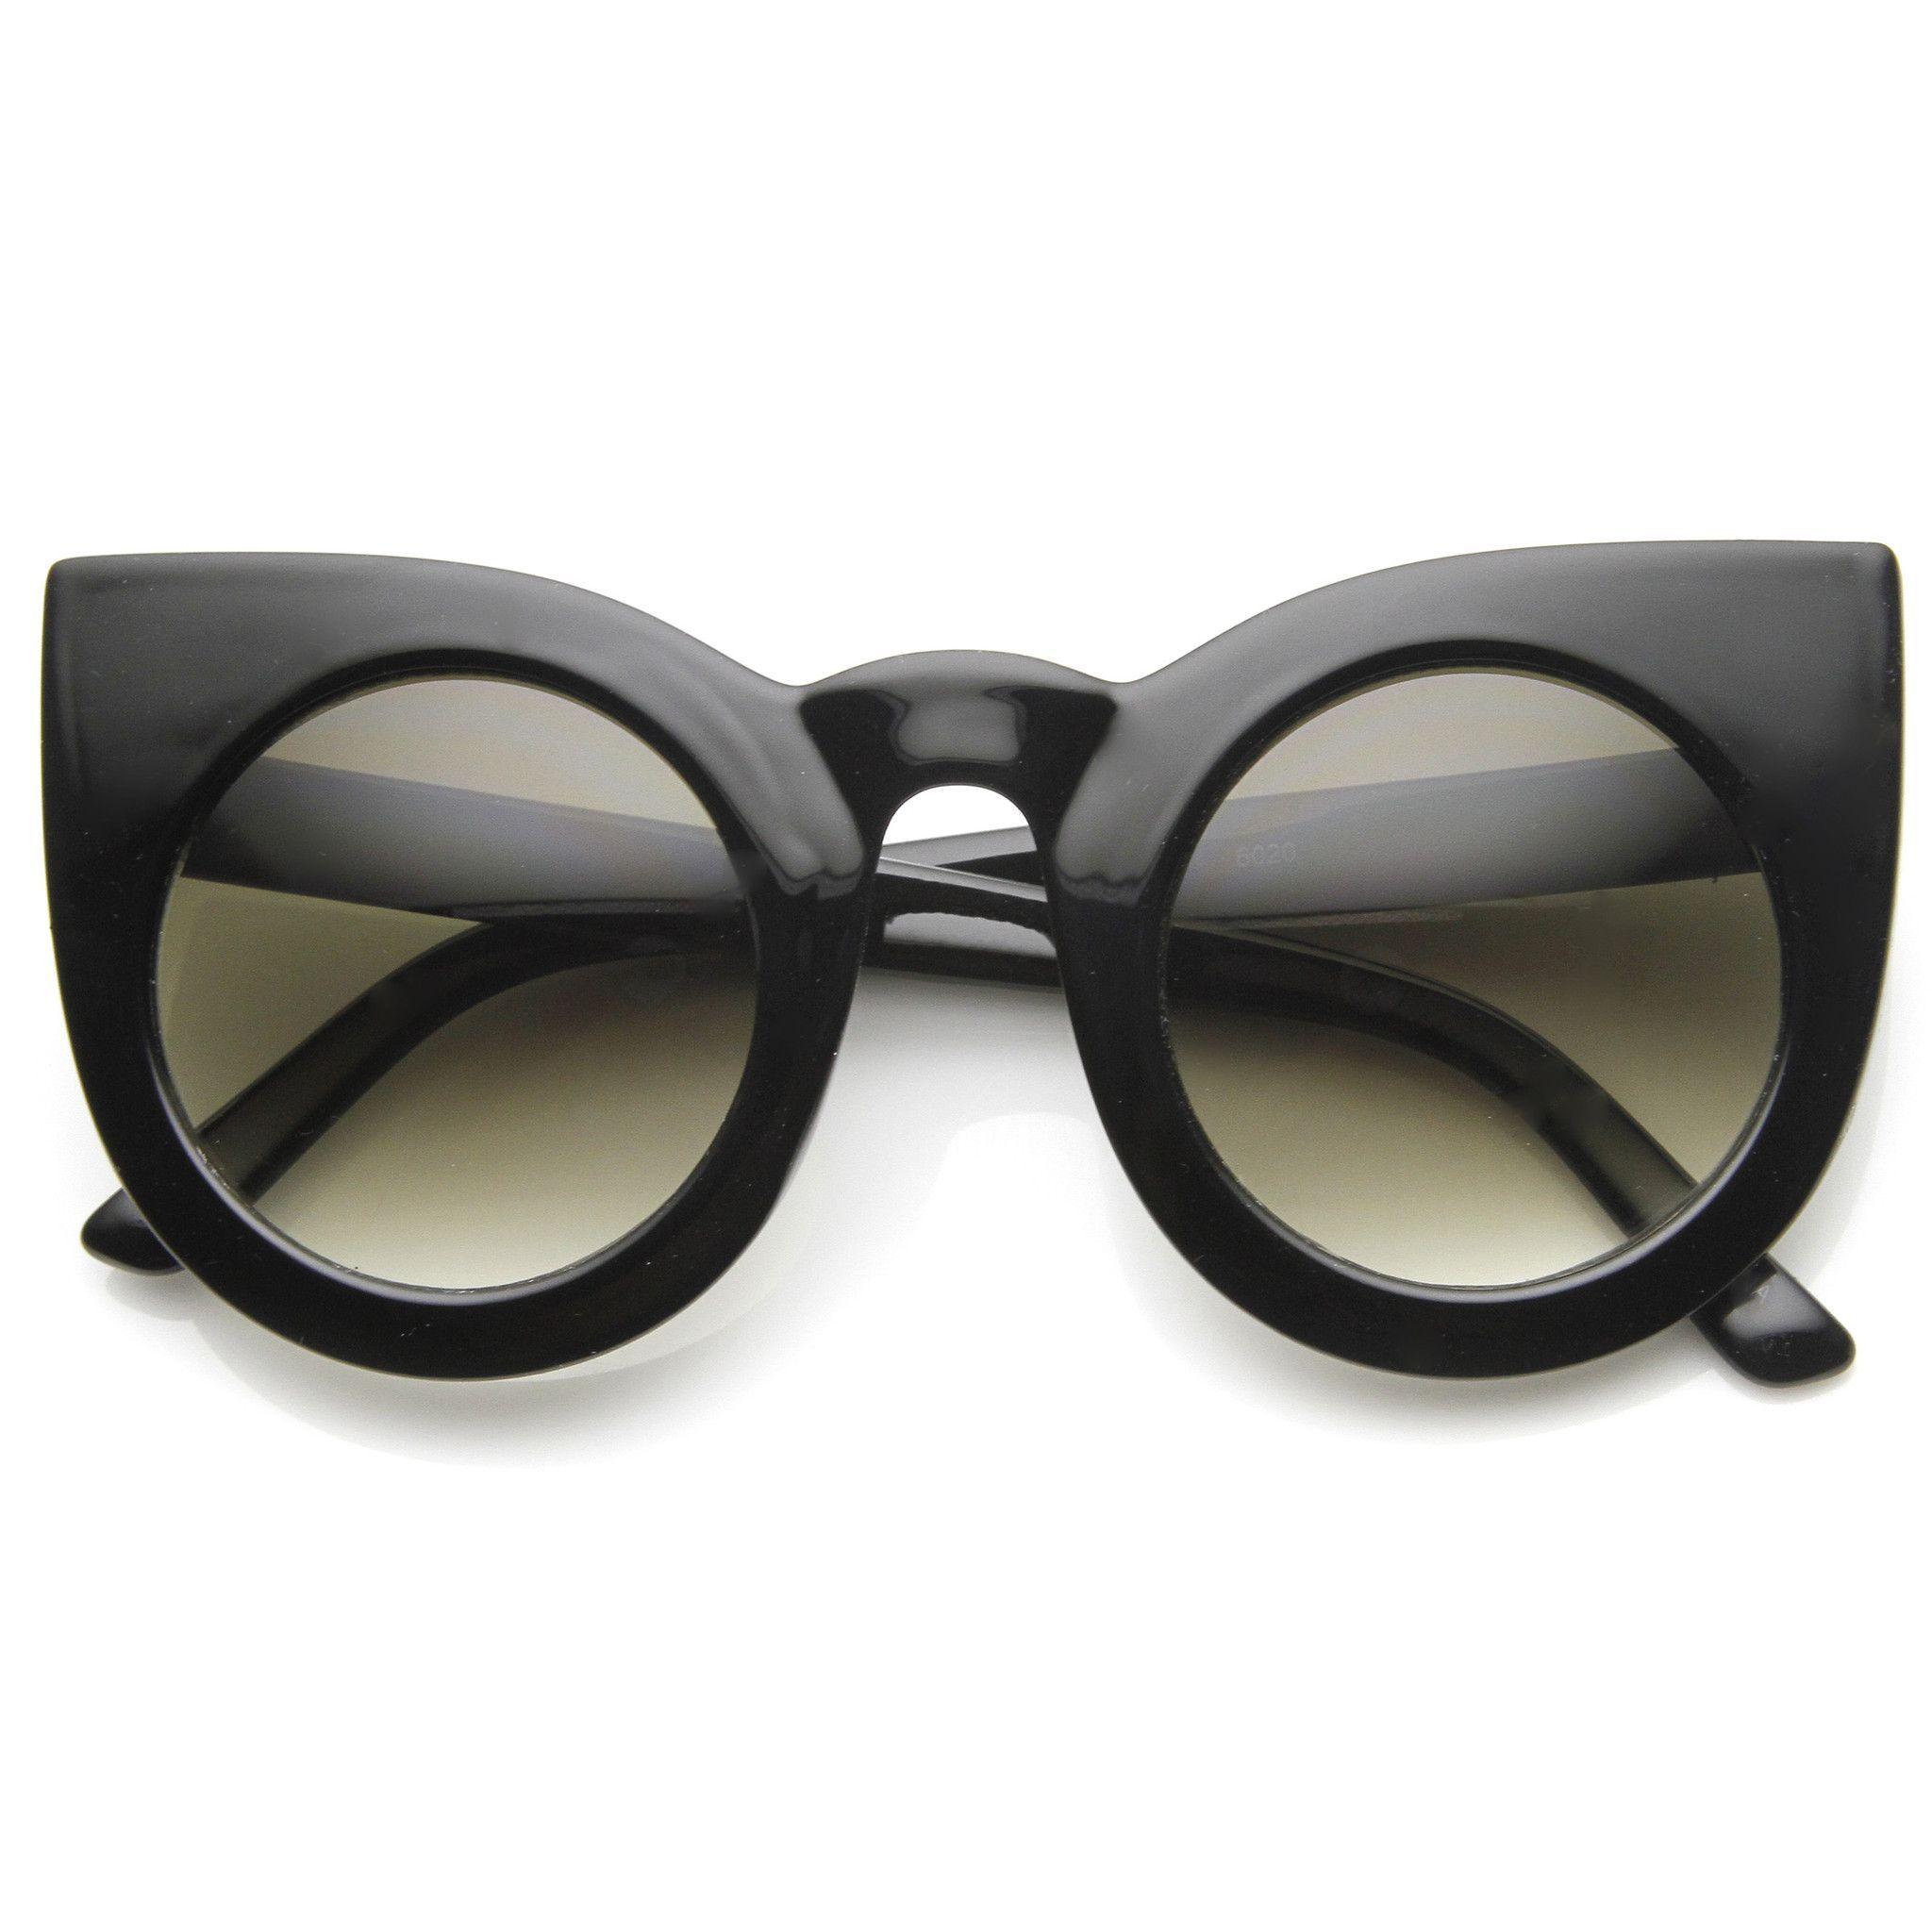 32b7b524c9 Designer Inspired Large Round Circle Pointed Cat Eye Sunglasses 9180